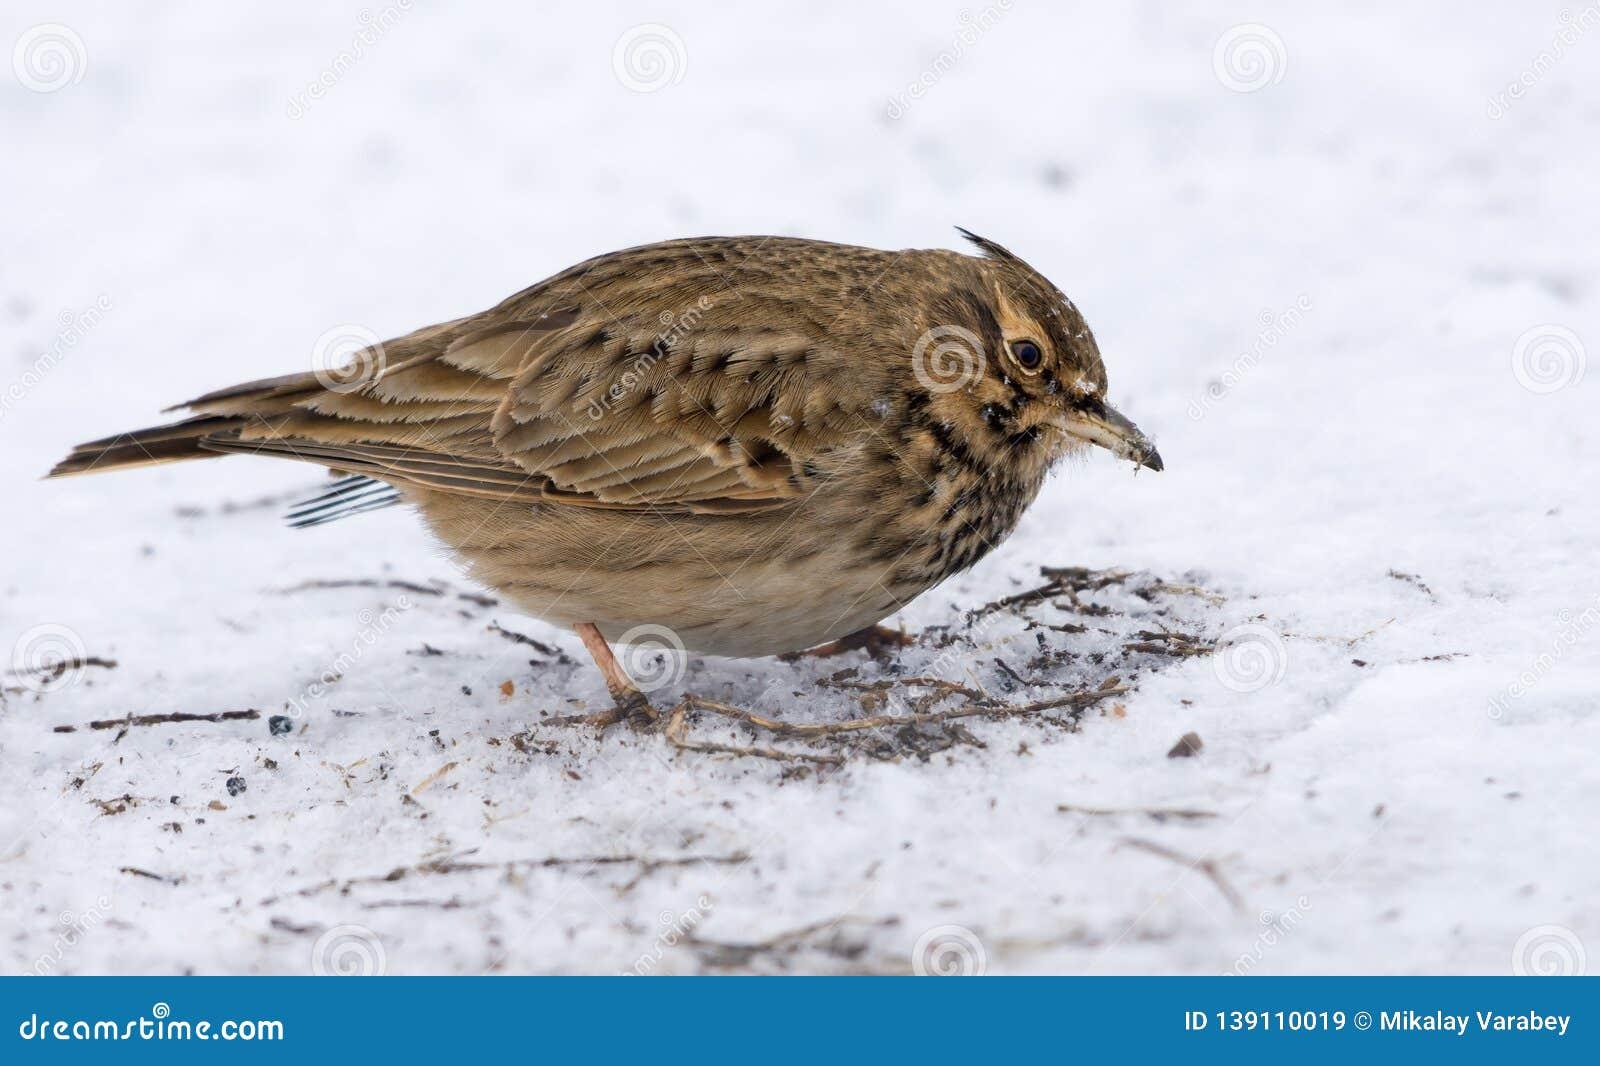 Crested Lark in search of feeding in snowy winter